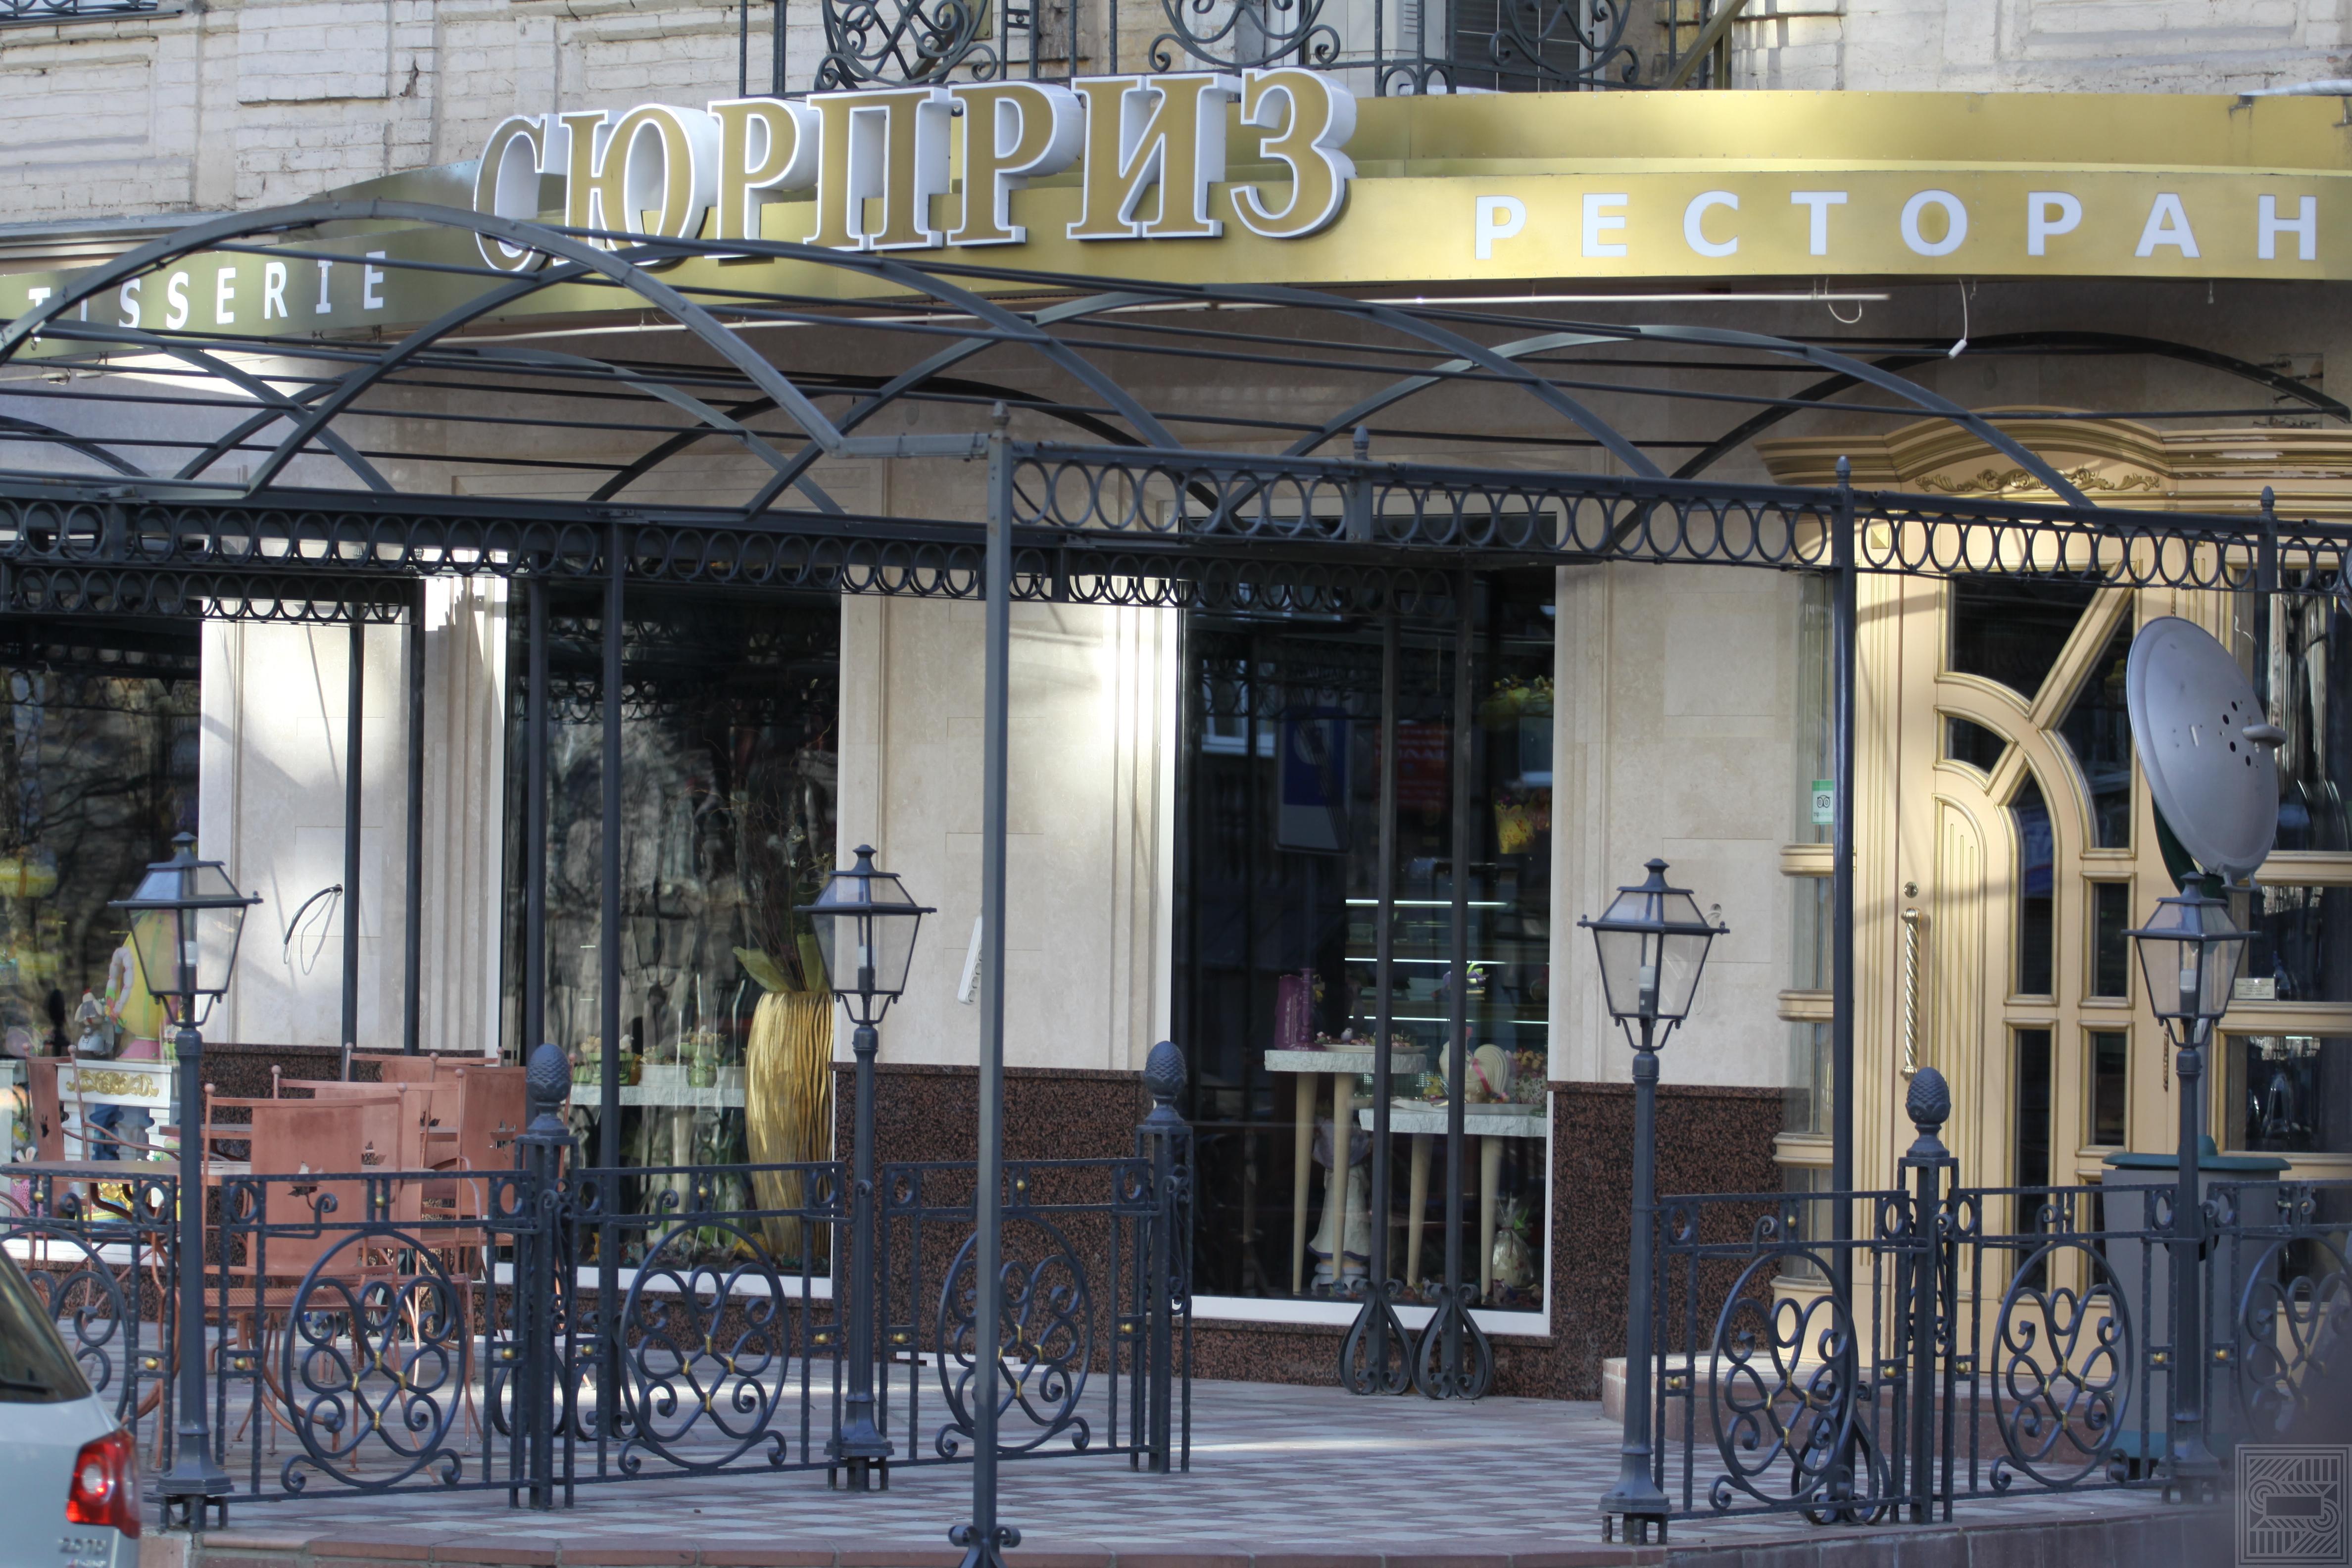 Облицовка фасада мрамором Botticino Fiorito и гранитом Rosa Balmoral facing - Oblitsovka sten mramorom Botticino Fiorito i granitom Rosa Balmoral 3